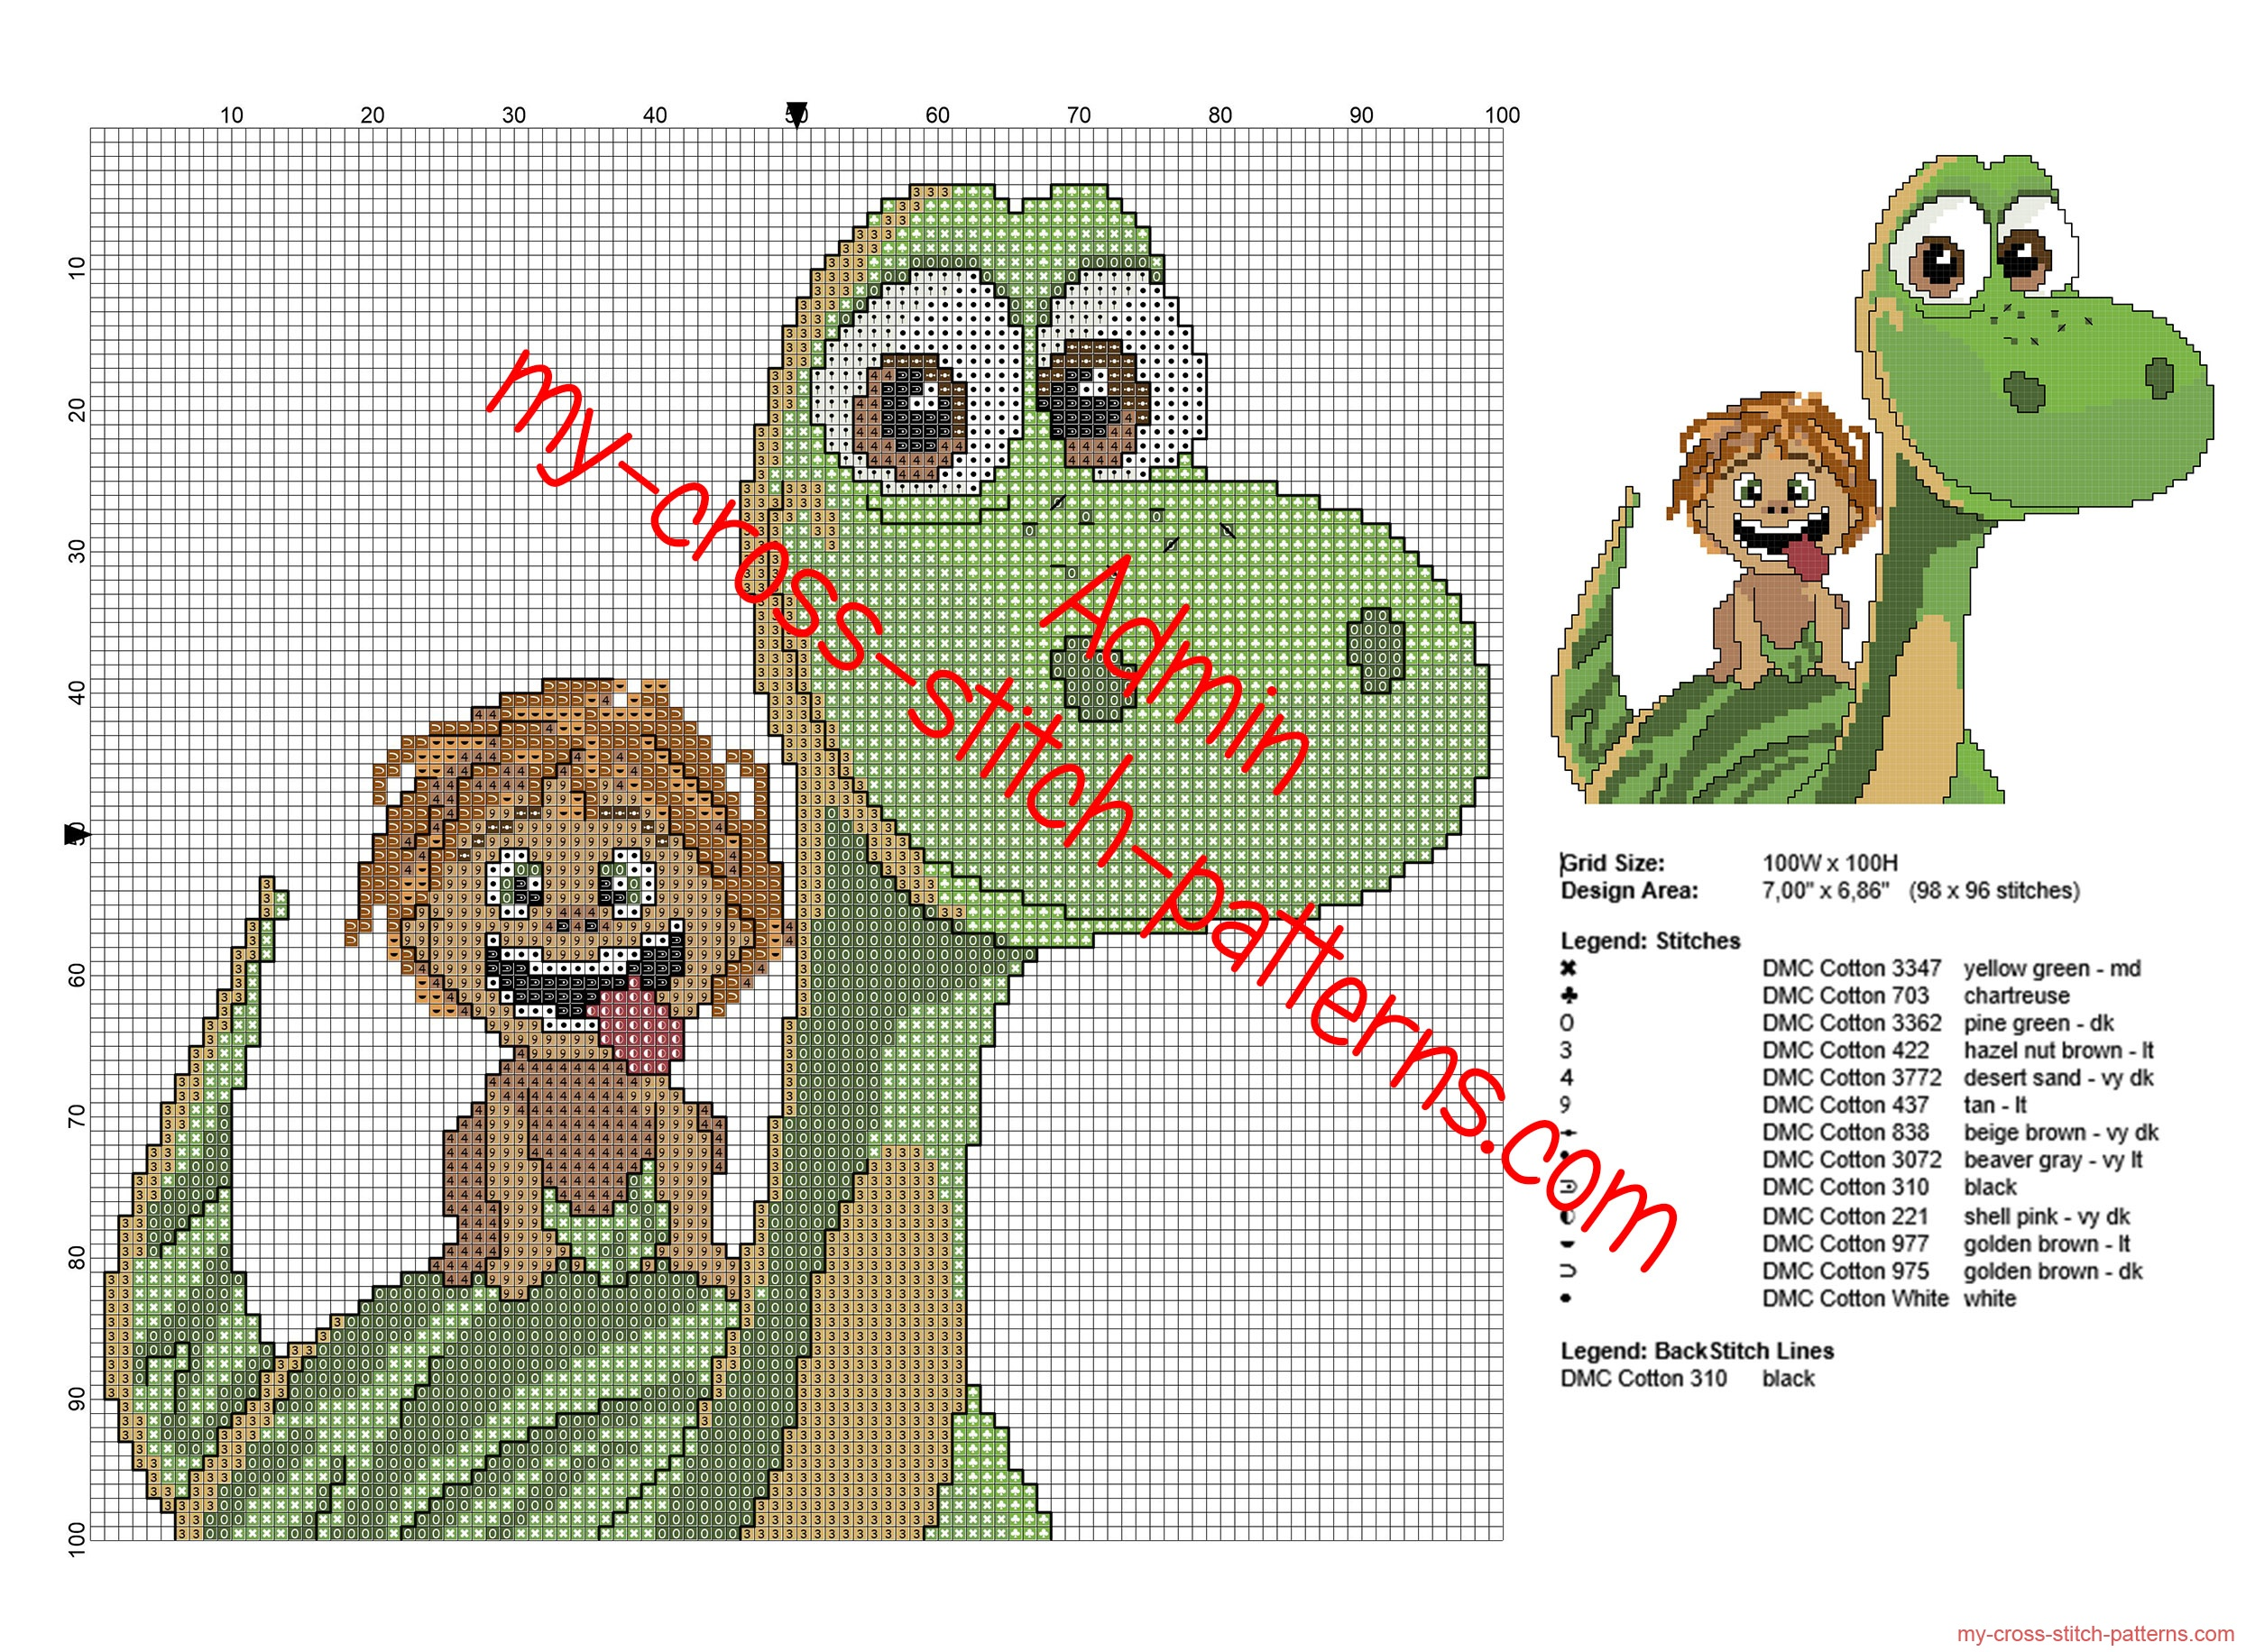 disney_the_good_dinosaur_free_cross_stitch_pattern